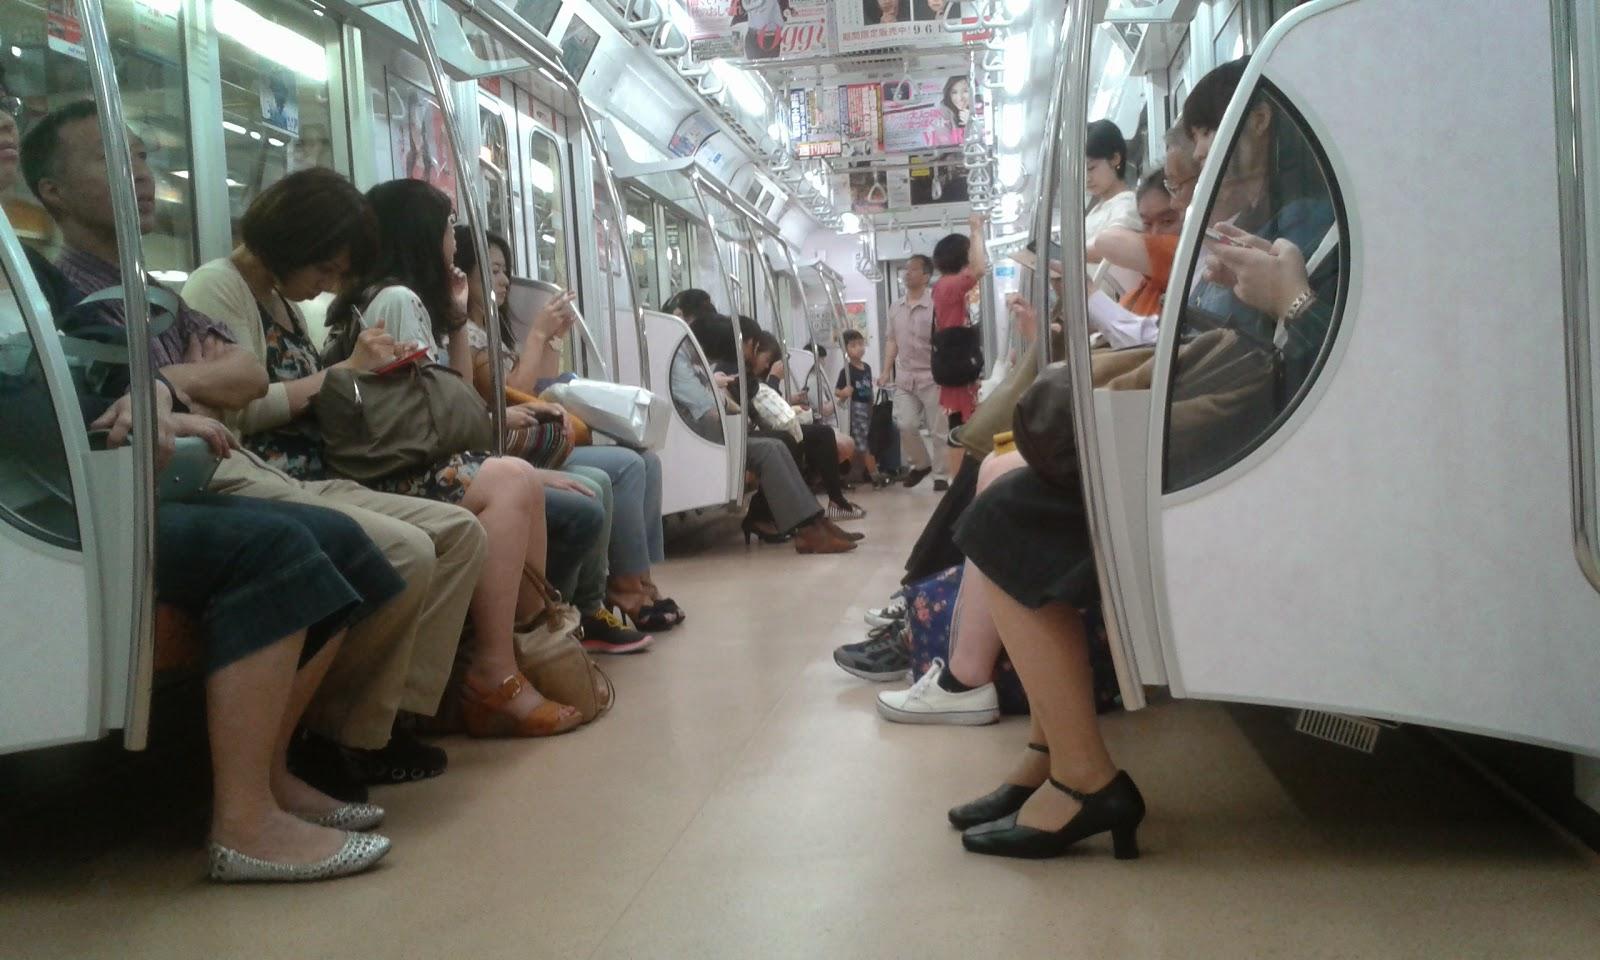 La metropolitana di sera